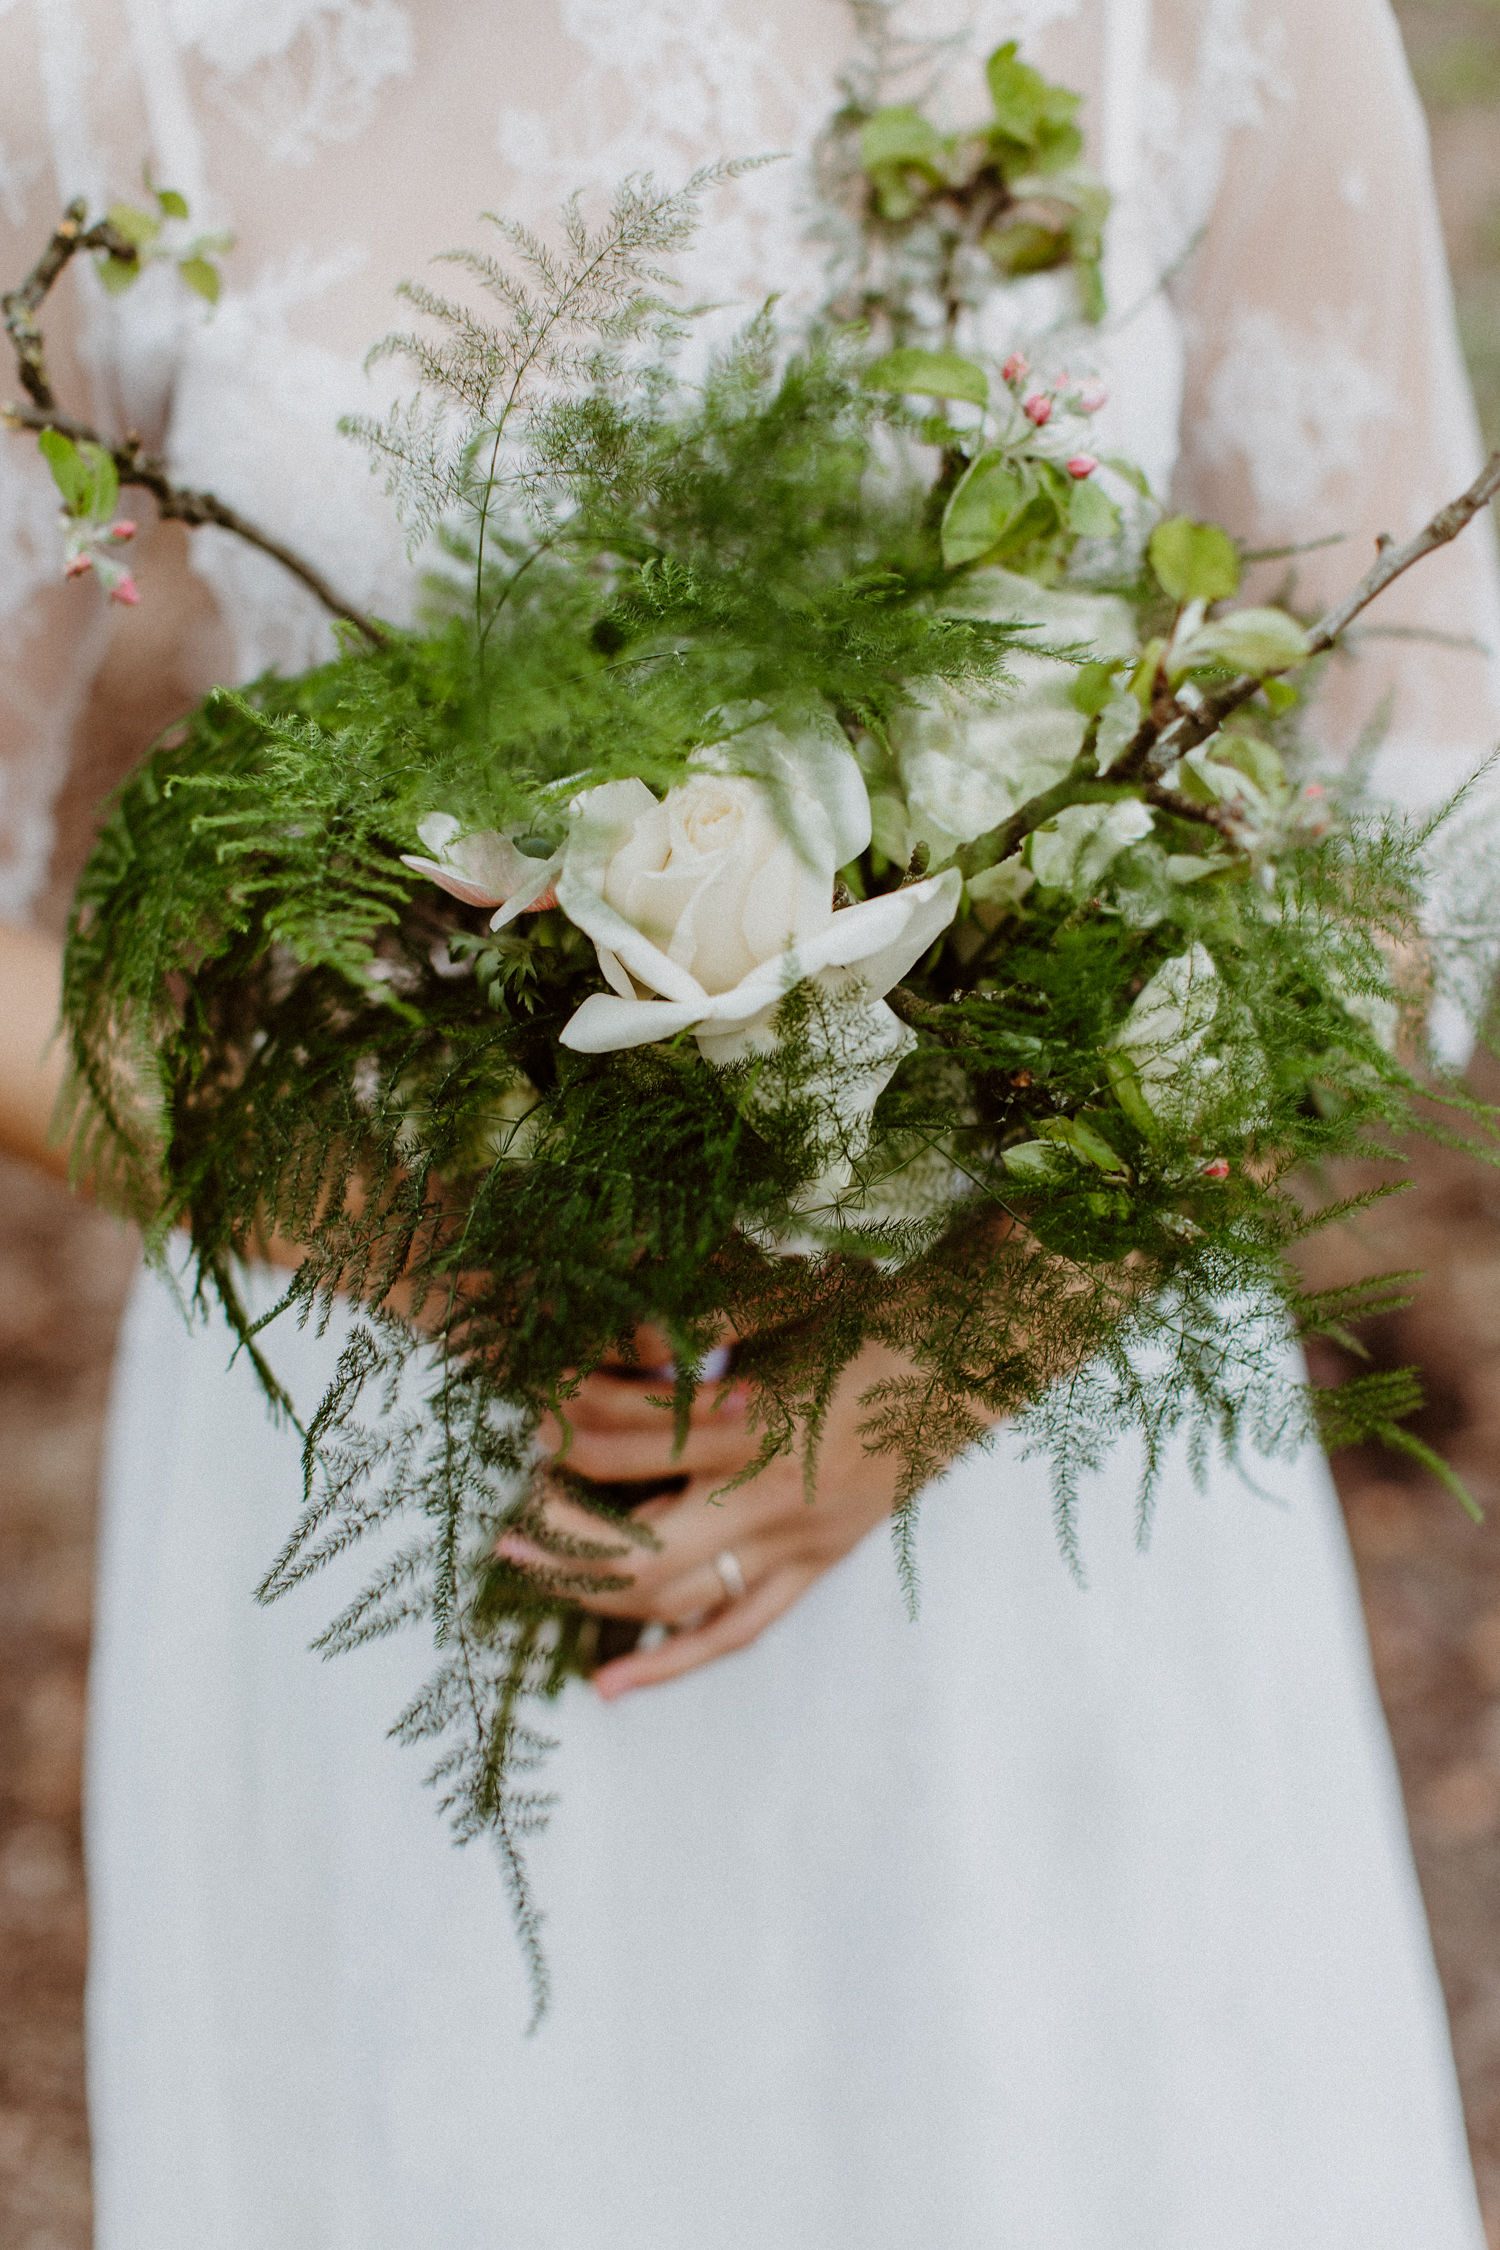 Brautstrauß Grün Greenery mit Farn und Ranunkeln